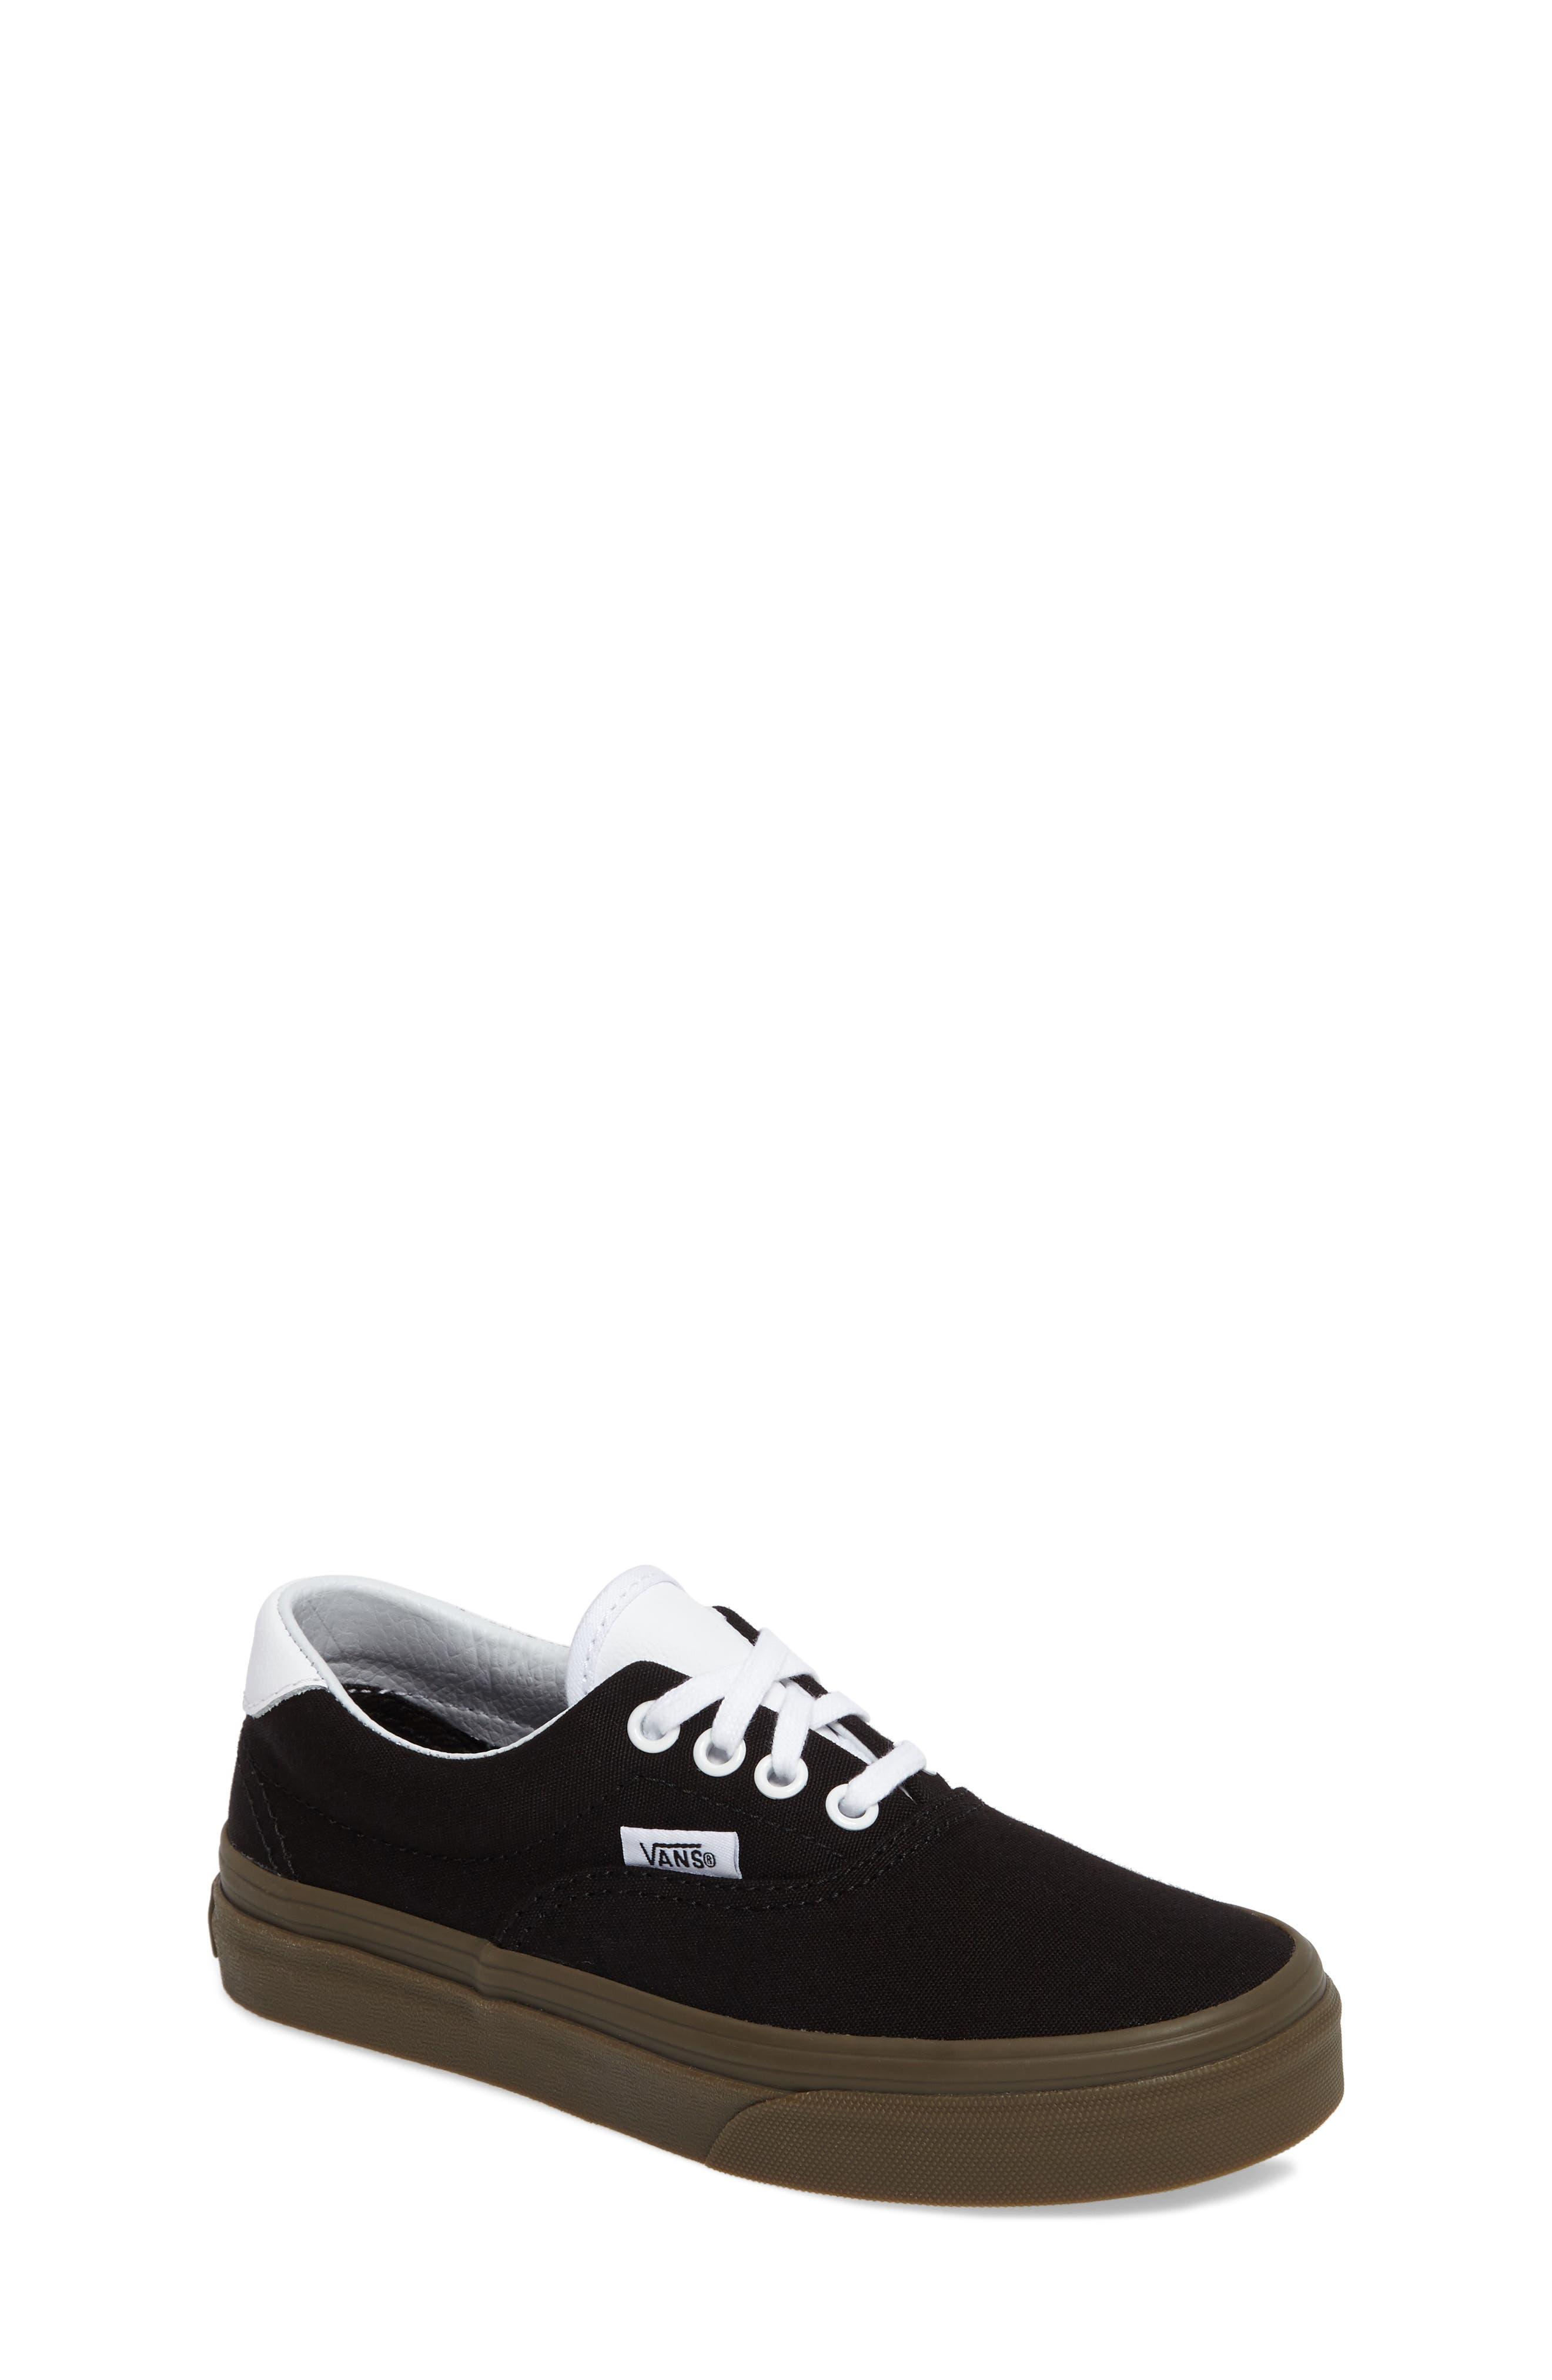 Alternate Image 1 Selected - Vans Era 59 Bleacher Sneaker (Toddler, Little Kid & Big Kid)